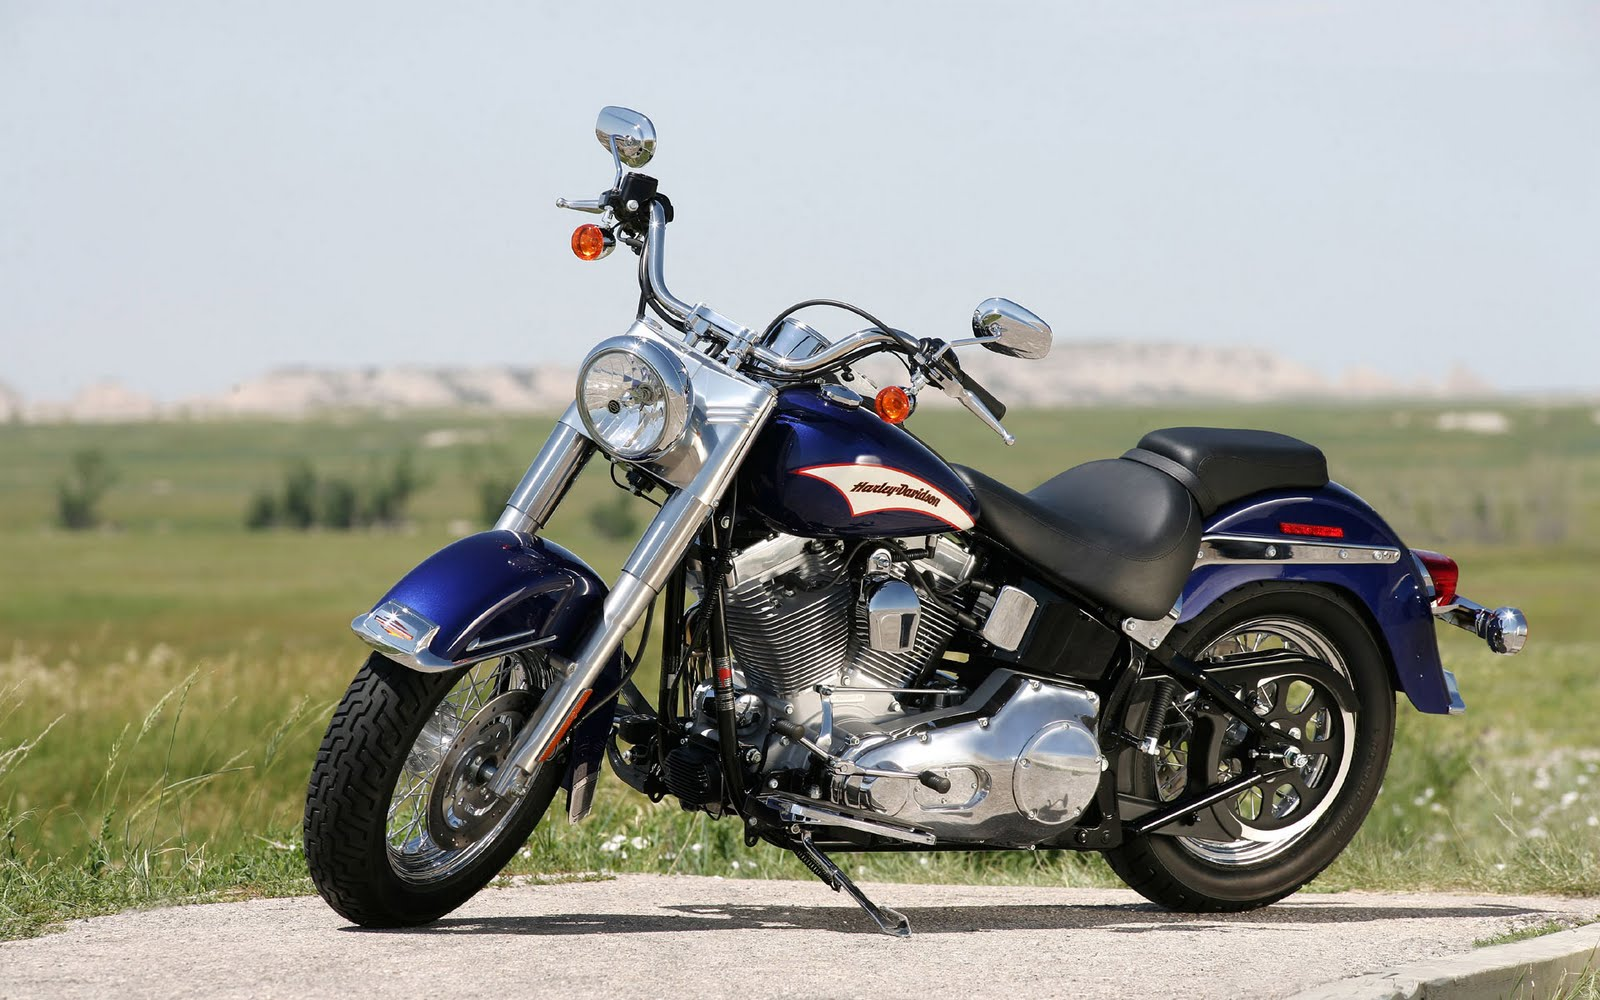 Harley Davidson Wallpaper Download 27210 1600x1000